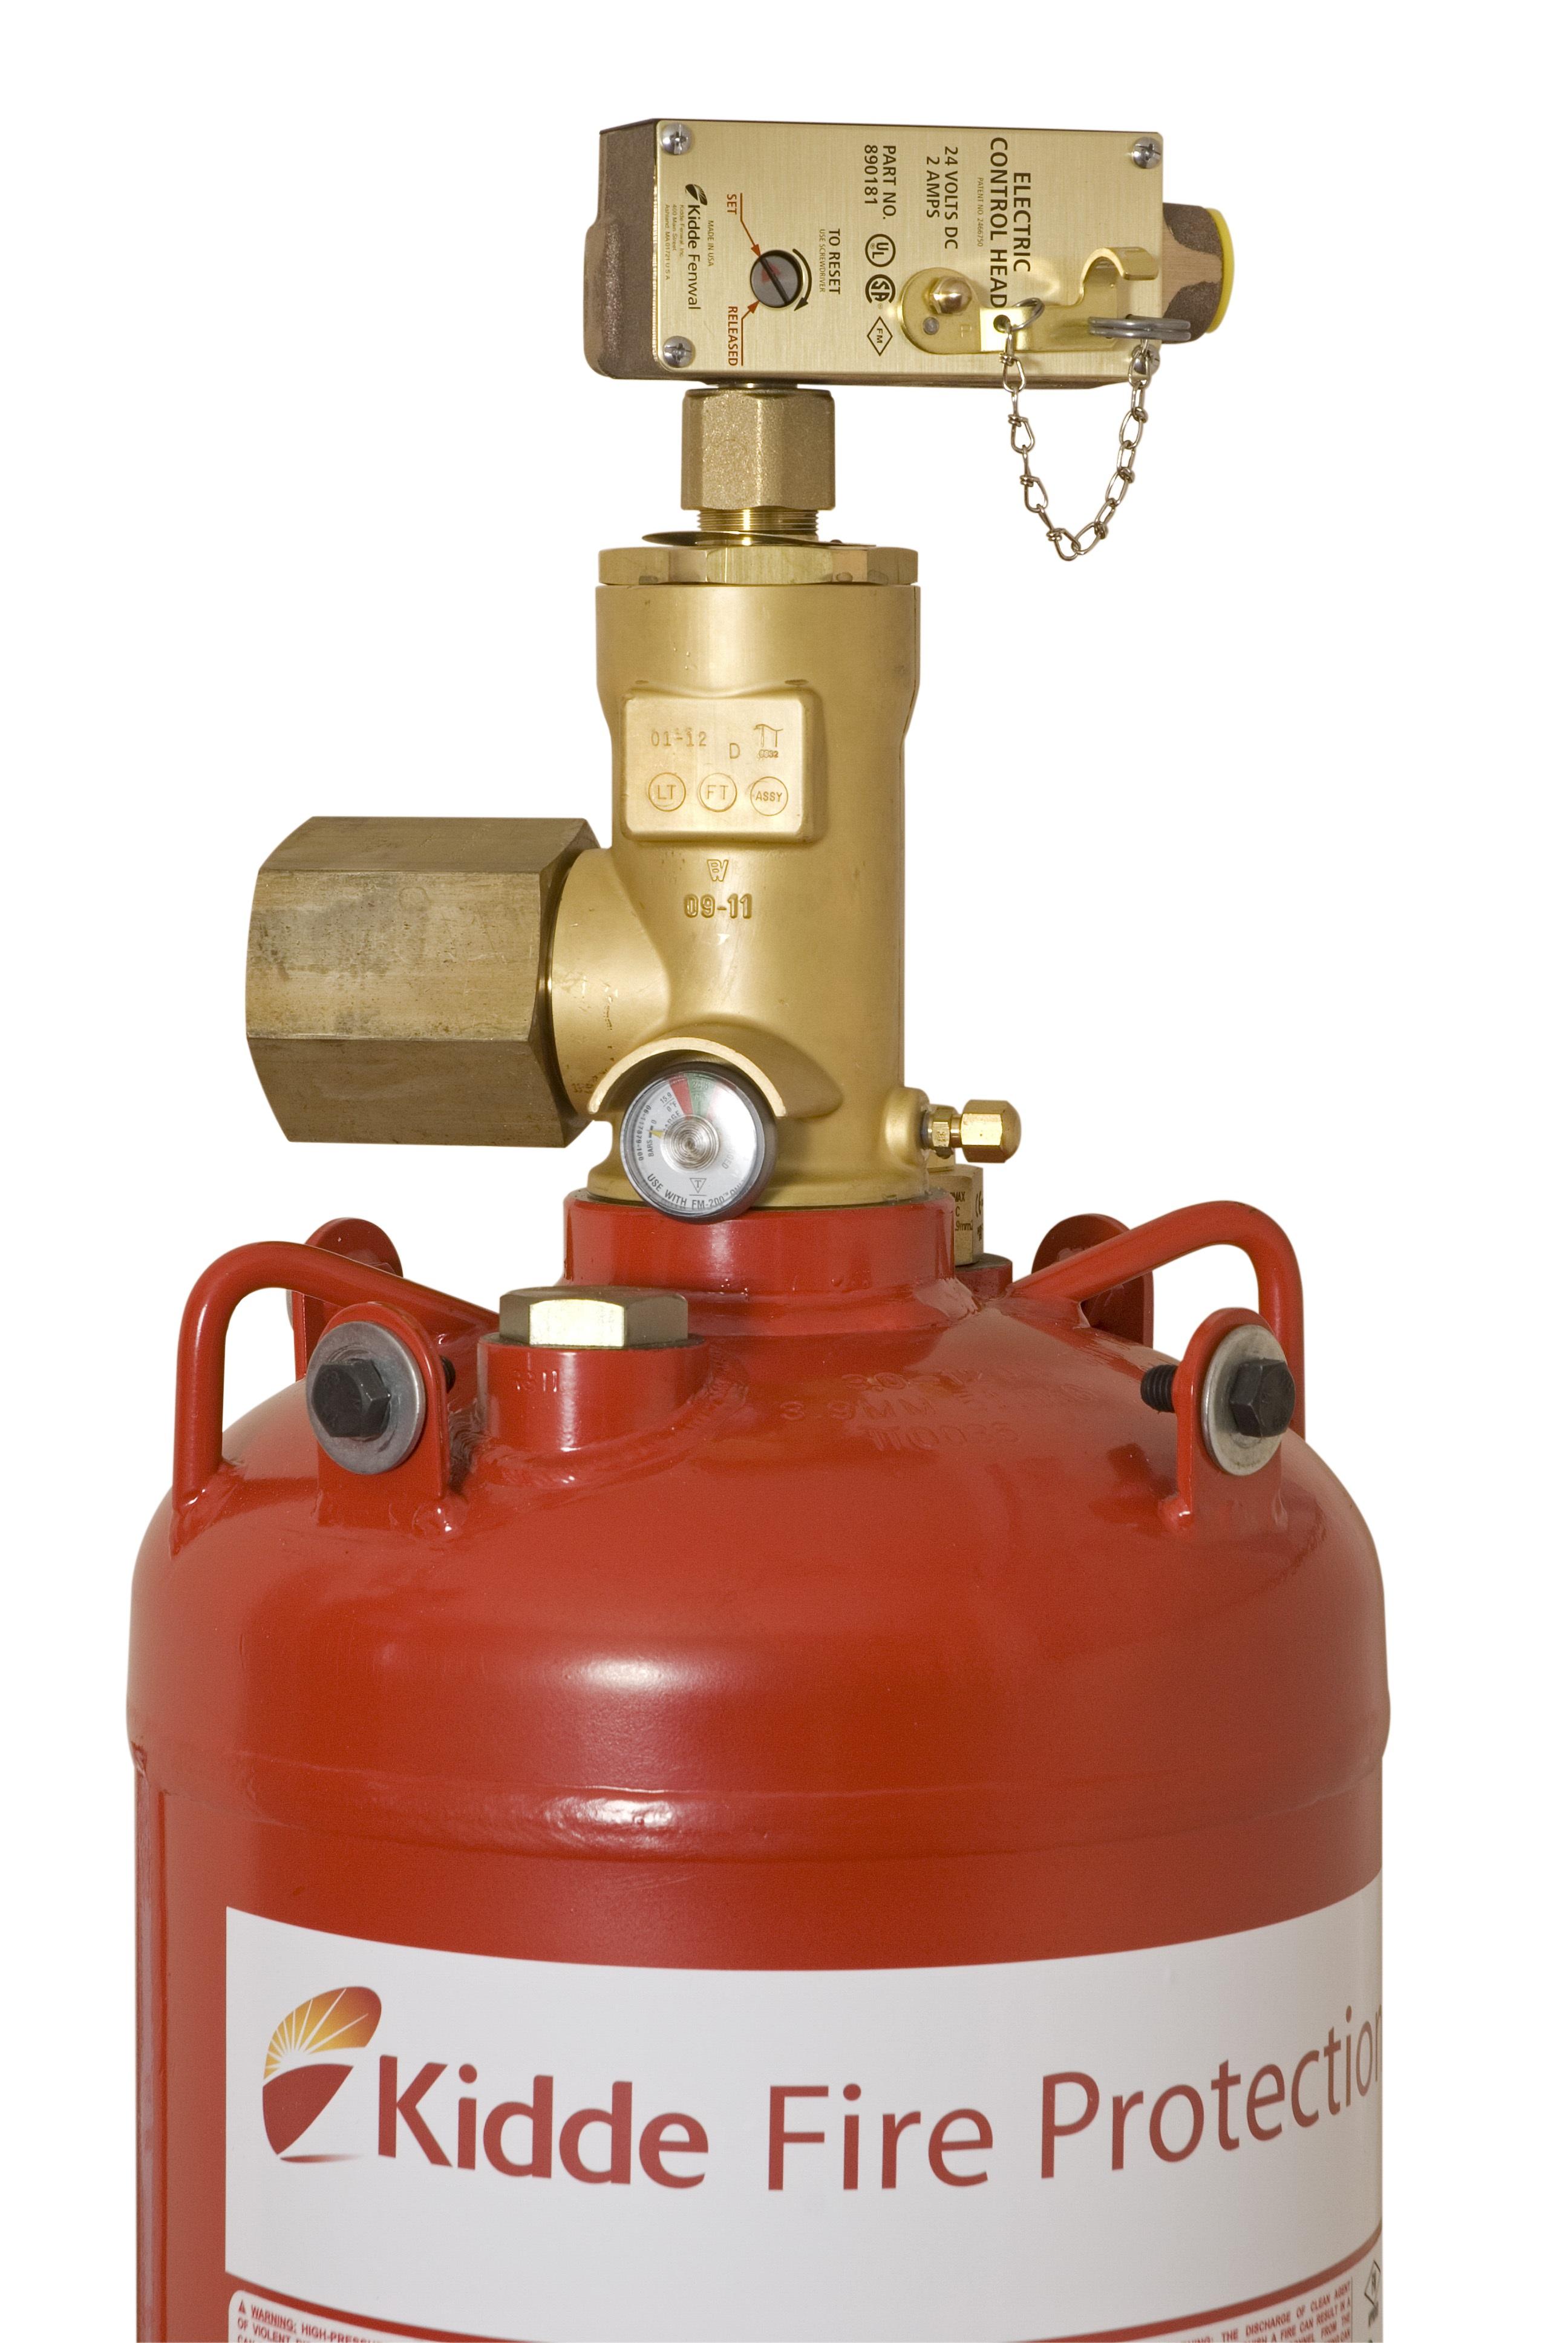 Kidde Gx 20 With Fm 200 Fire Extinguishing System